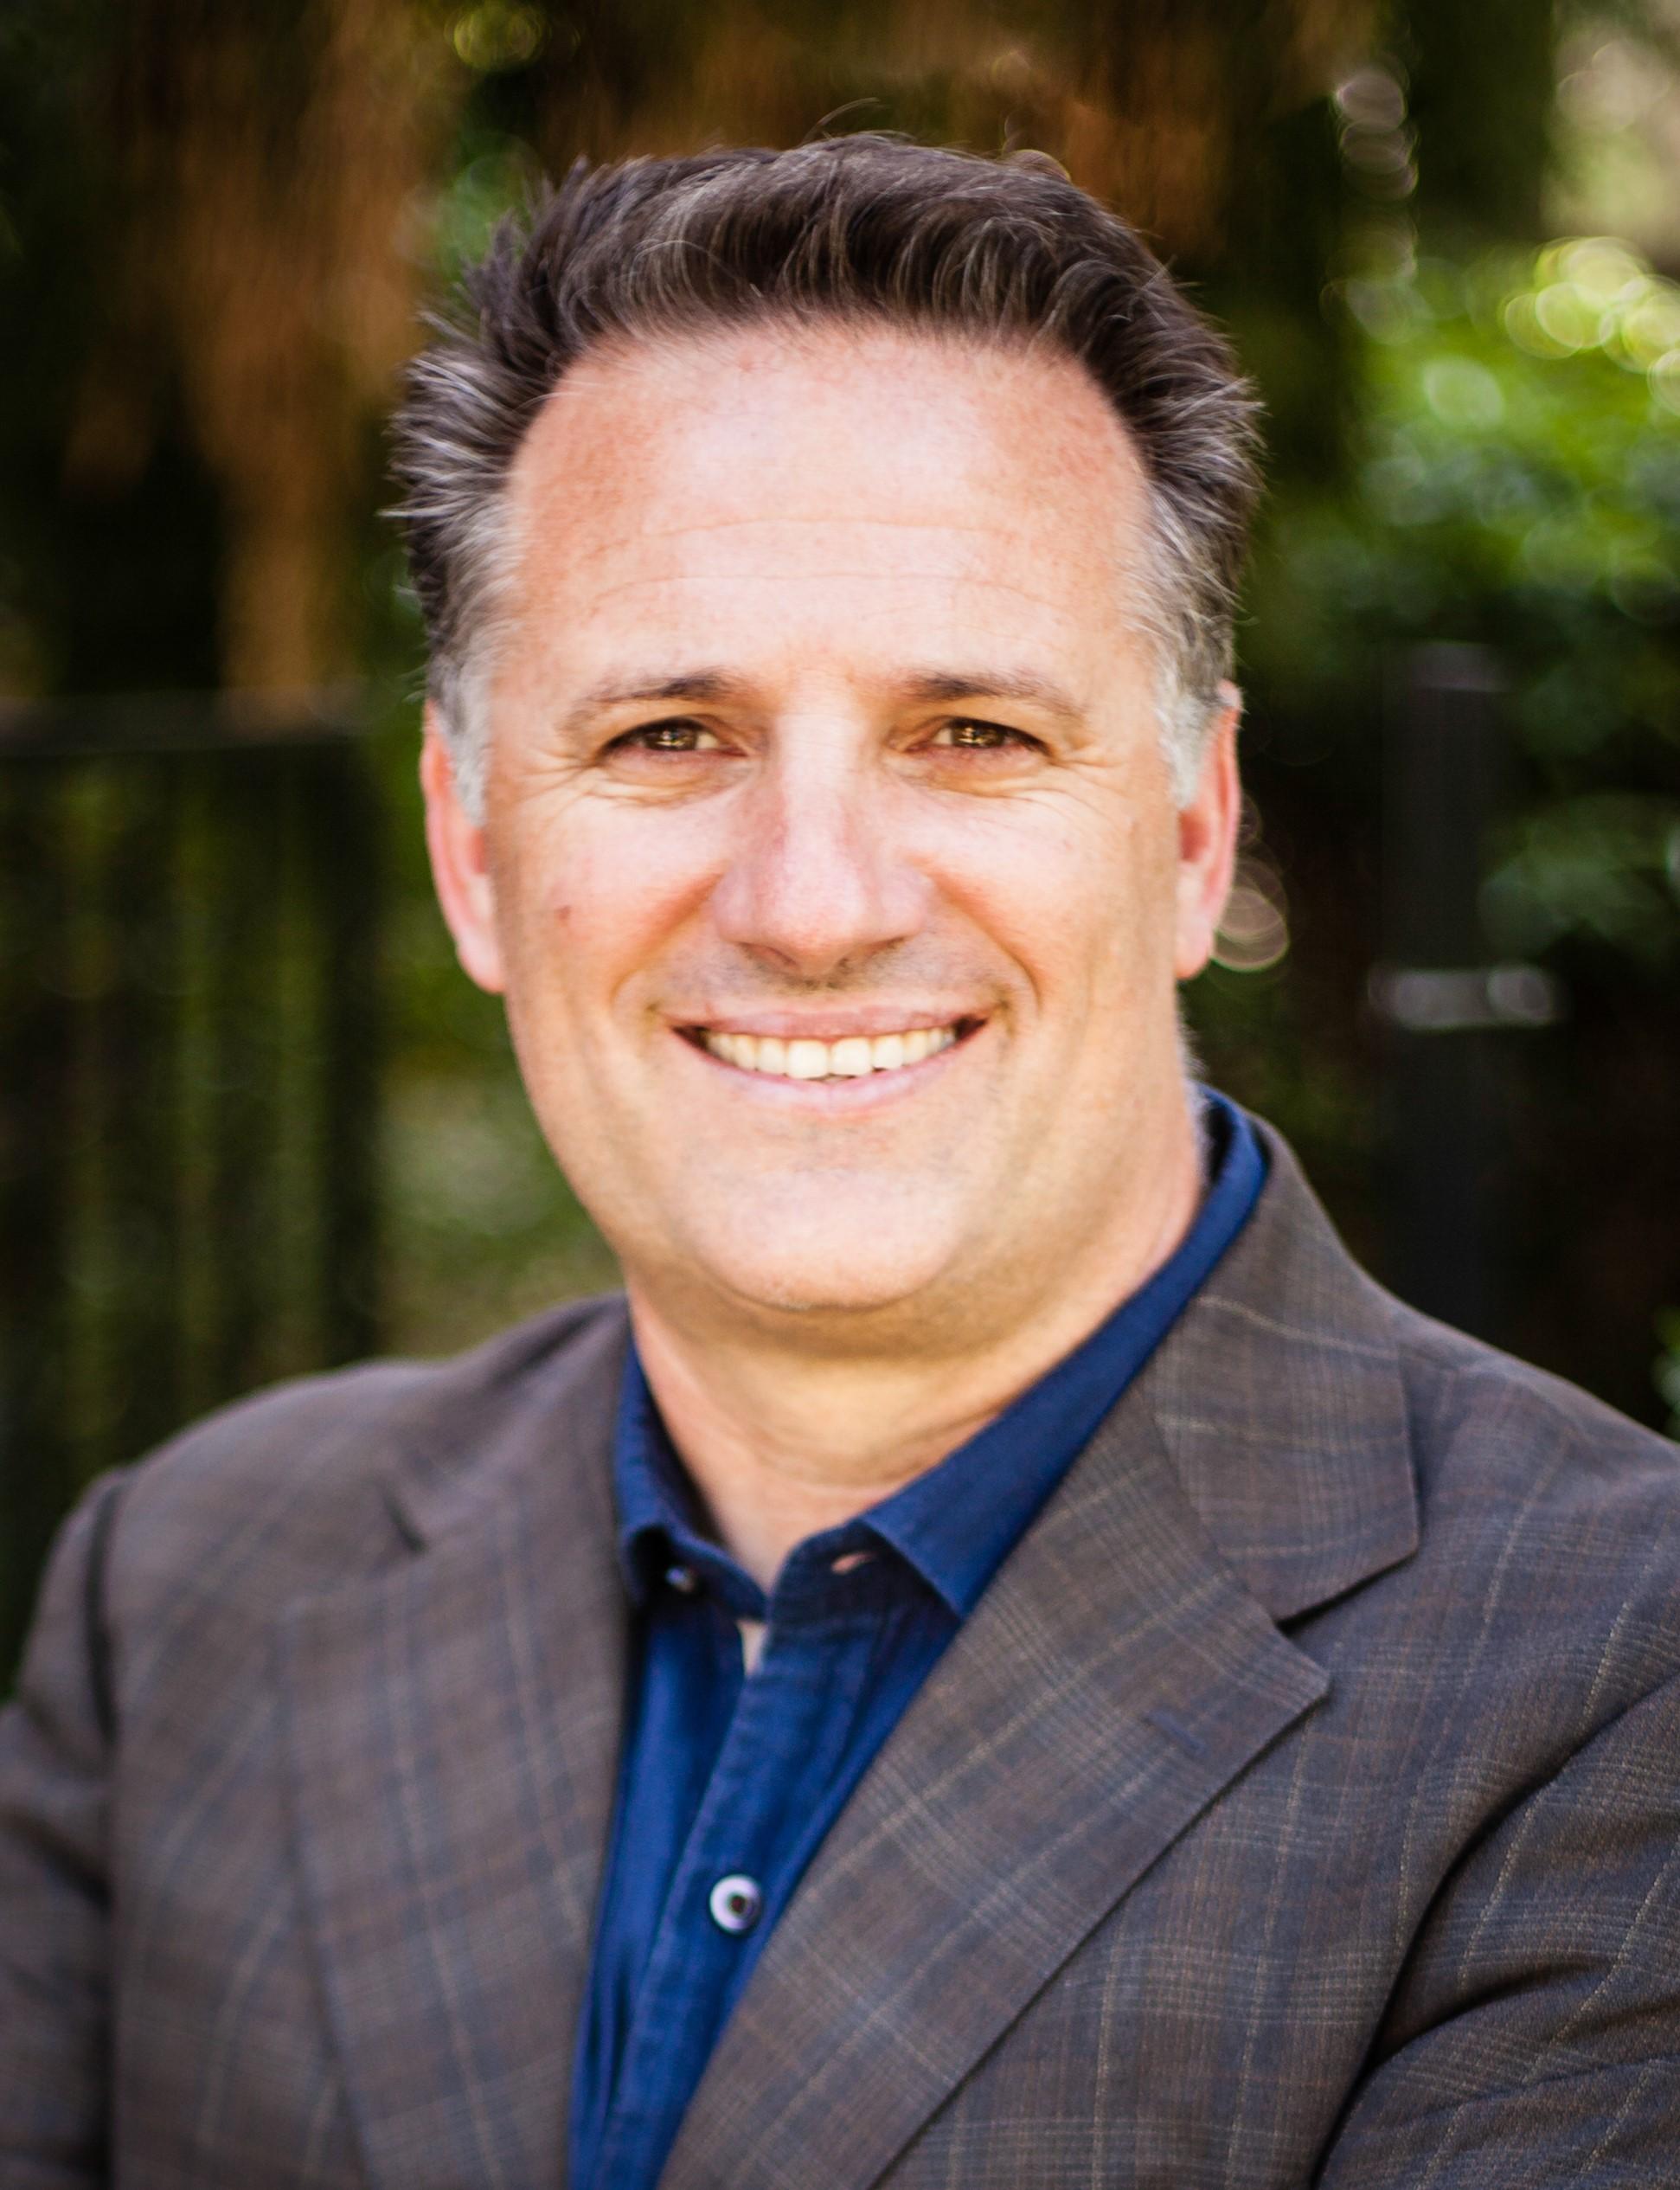 Rev. Tod Bolsinger  Vice-President Vocation Fuller Theological Seminary Pasadena, CA